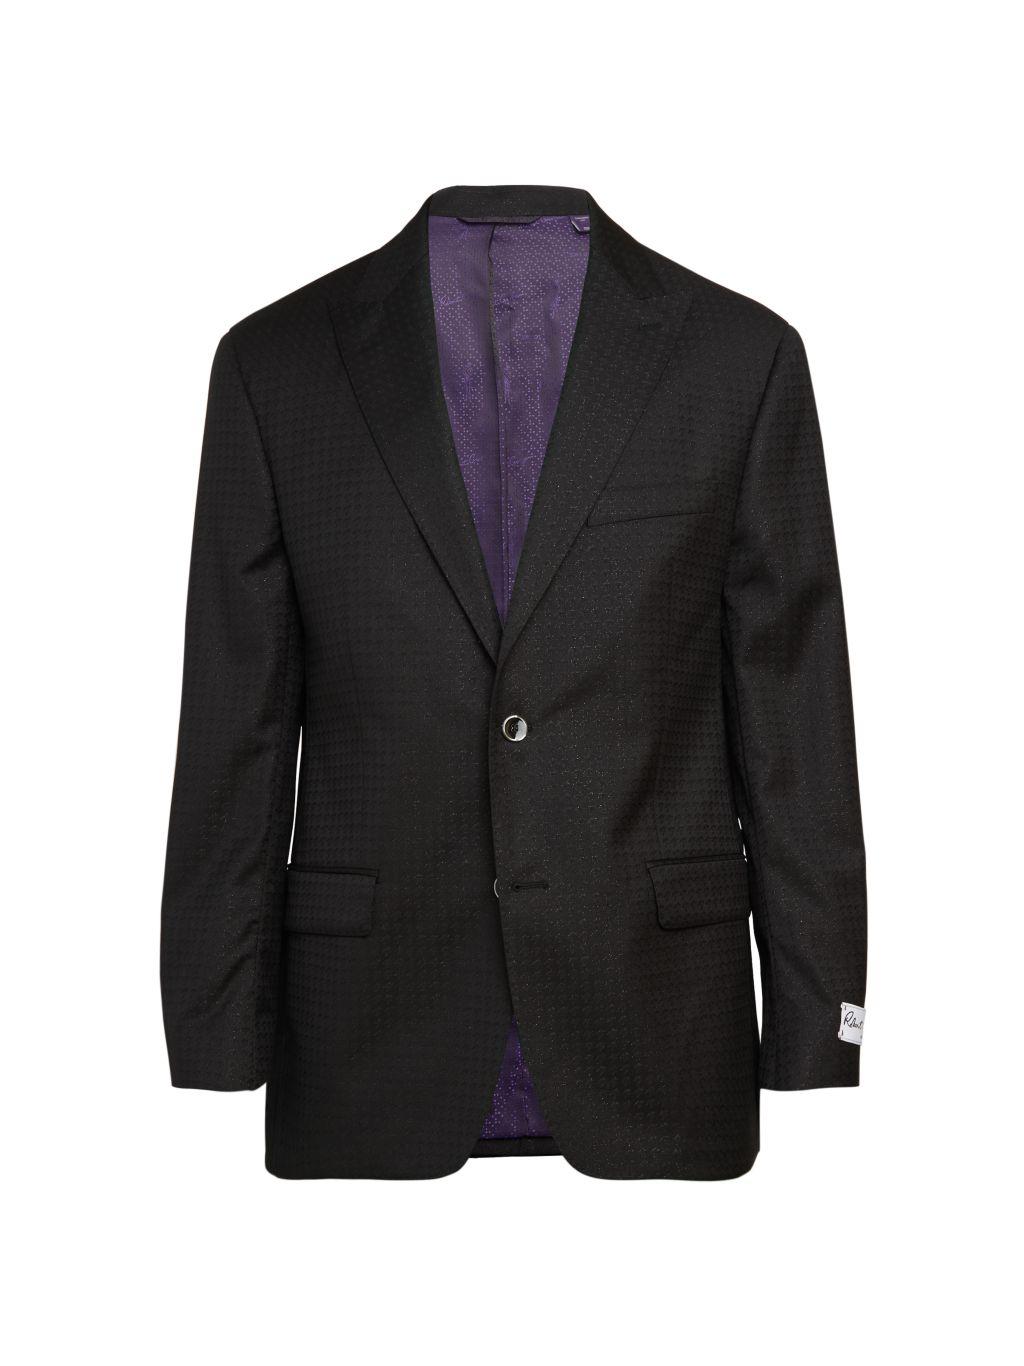 Robert Graham Houndstooth Wool-Blend Jacket